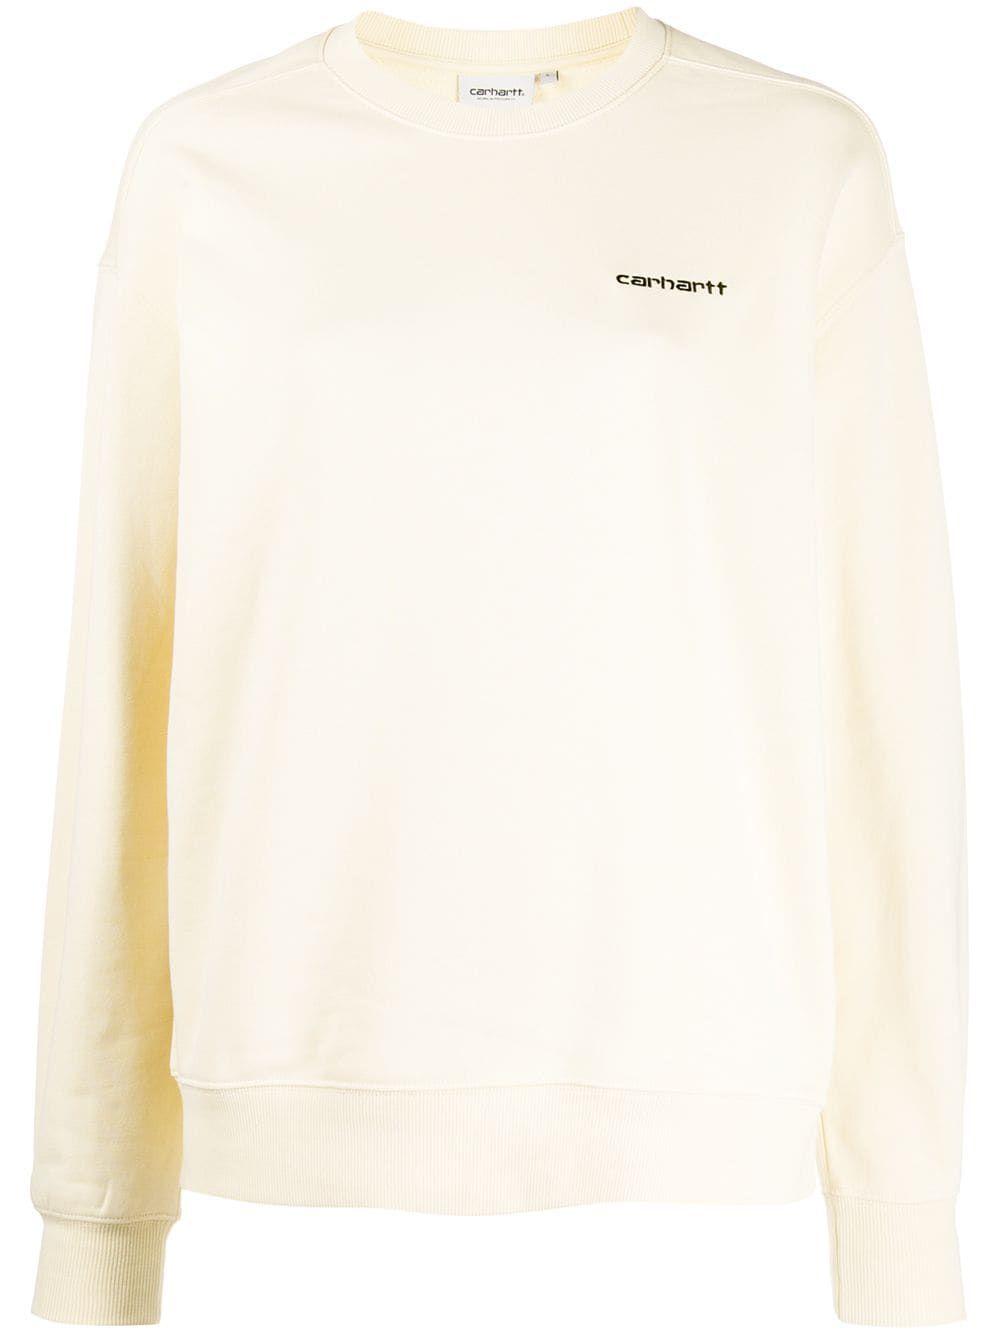 Carhartt I027477 Flour Cotton Carhartt Cloth Sweatshirts Carhartt Size Clothing [ 1334 x 1000 Pixel ]